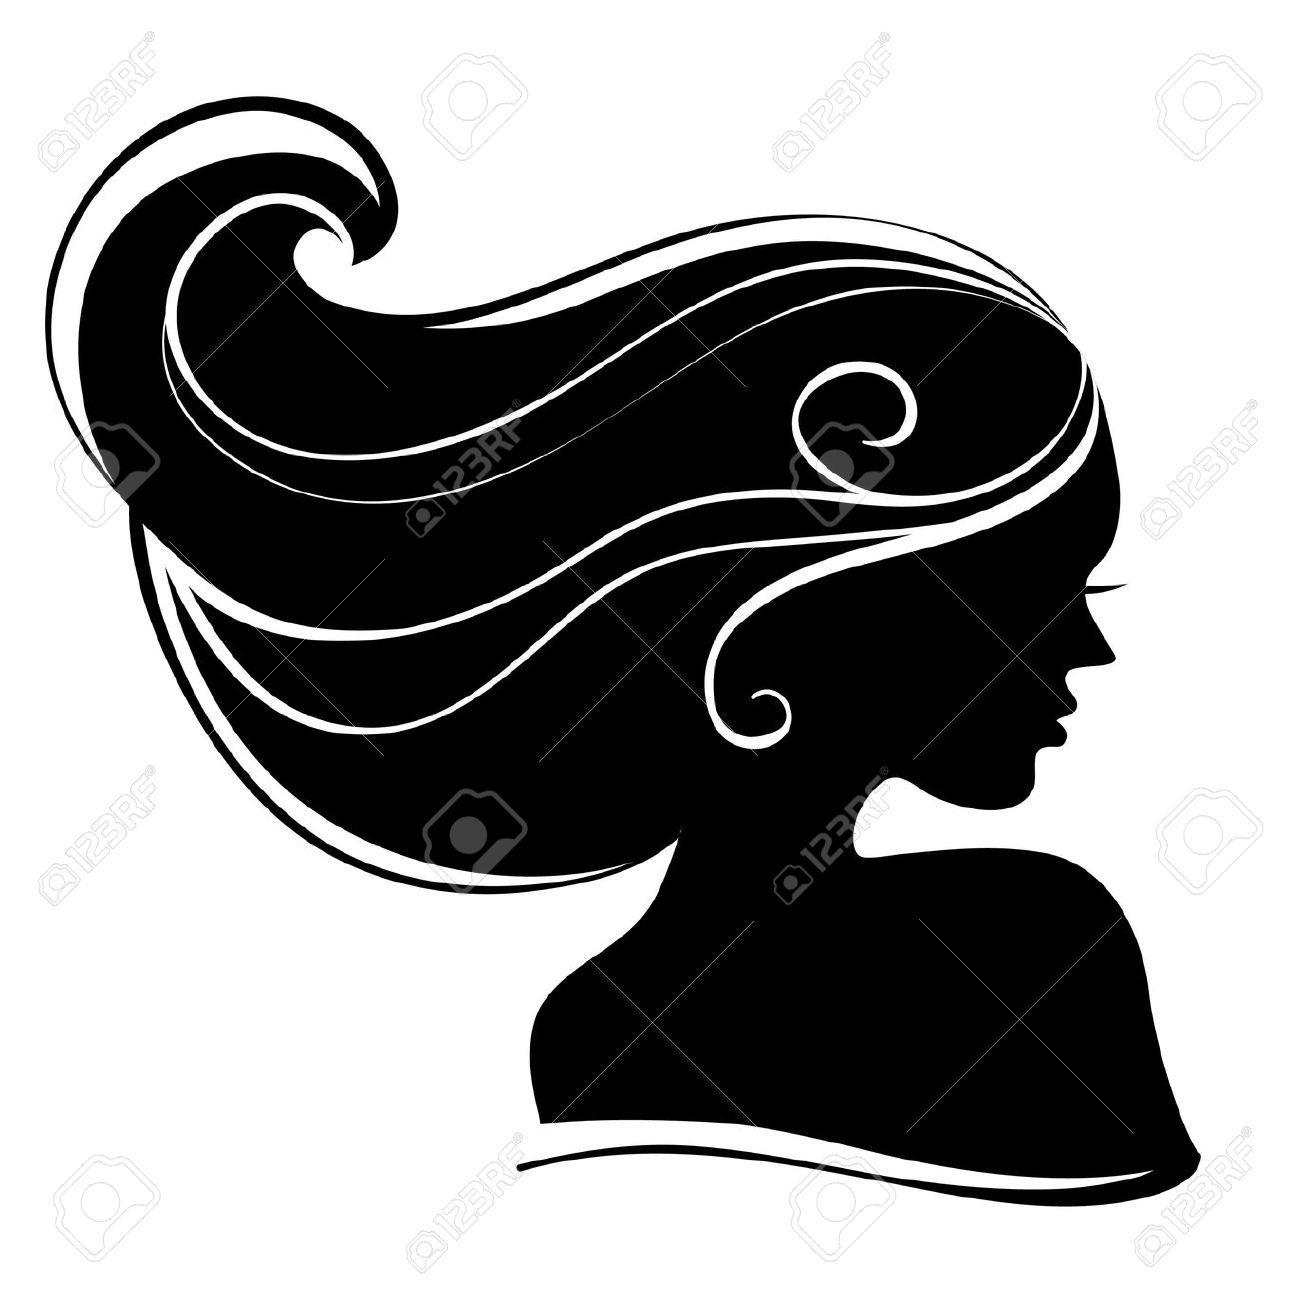 Stock Vector | Silhouette clip art, Woman face silhouette ...